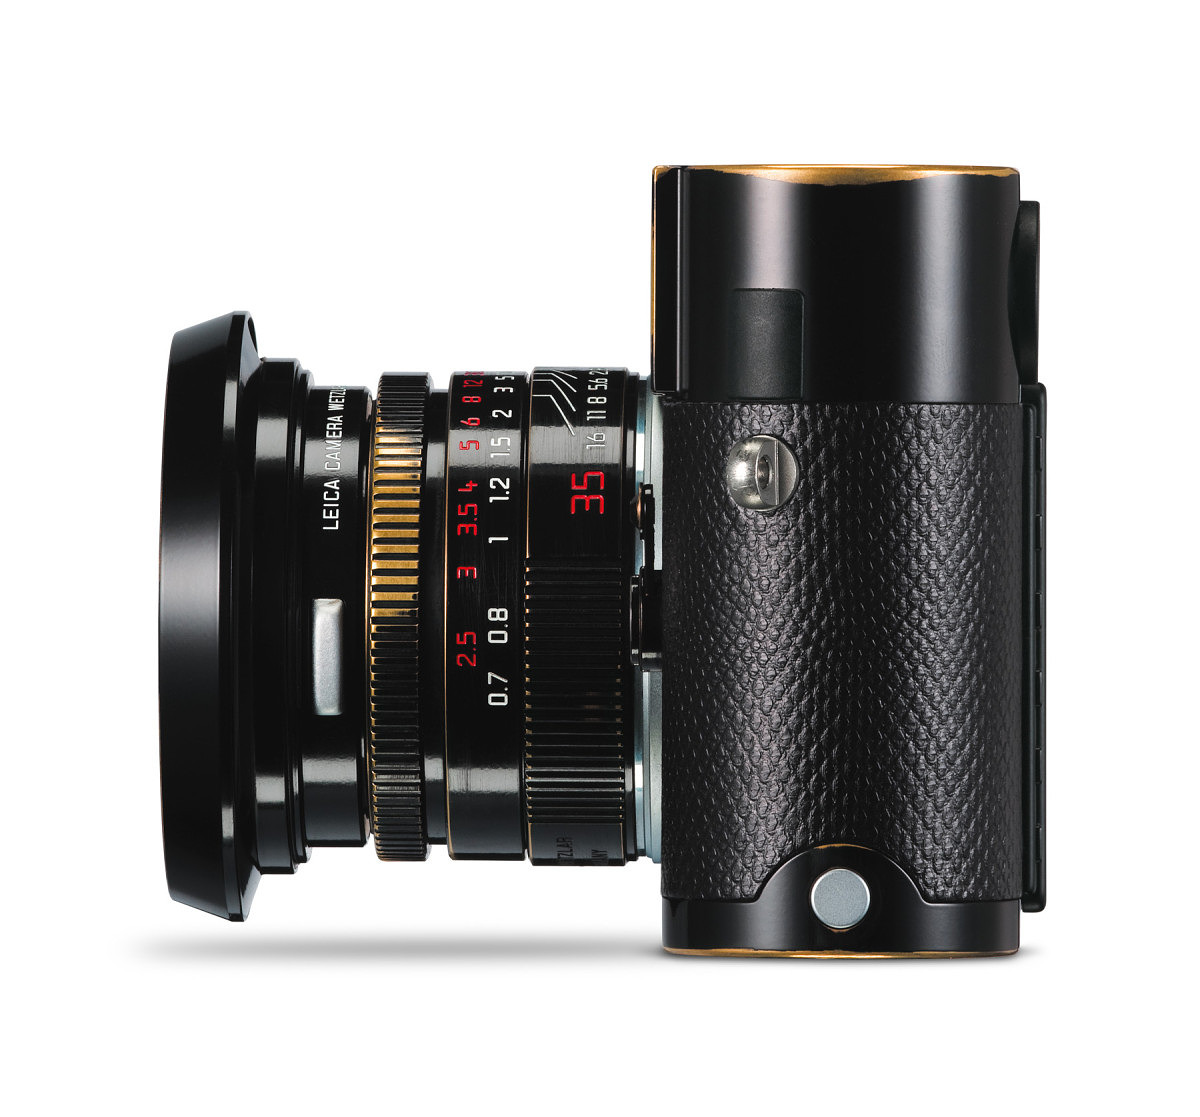 Leica_M-P_Special Edition_35mm_Lenny Kravitz_left